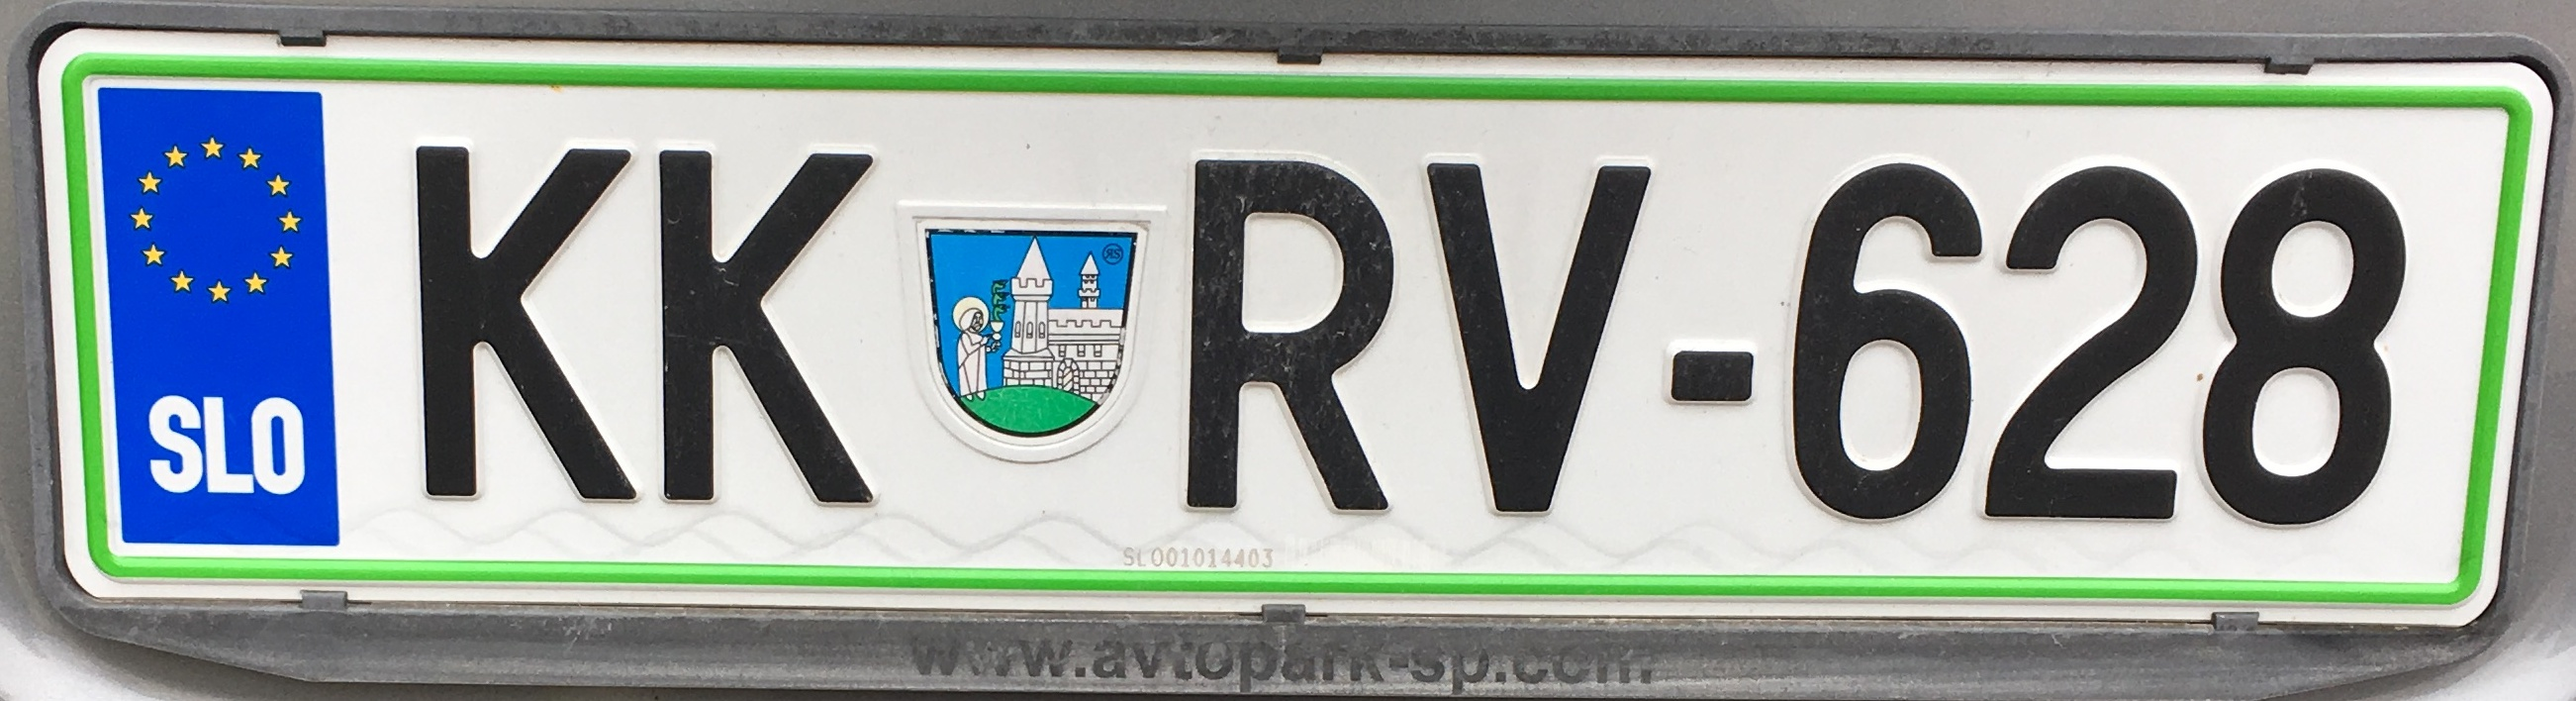 Registrační značka Slovinsko - KK - Krško, foto: www.podalnici.cz